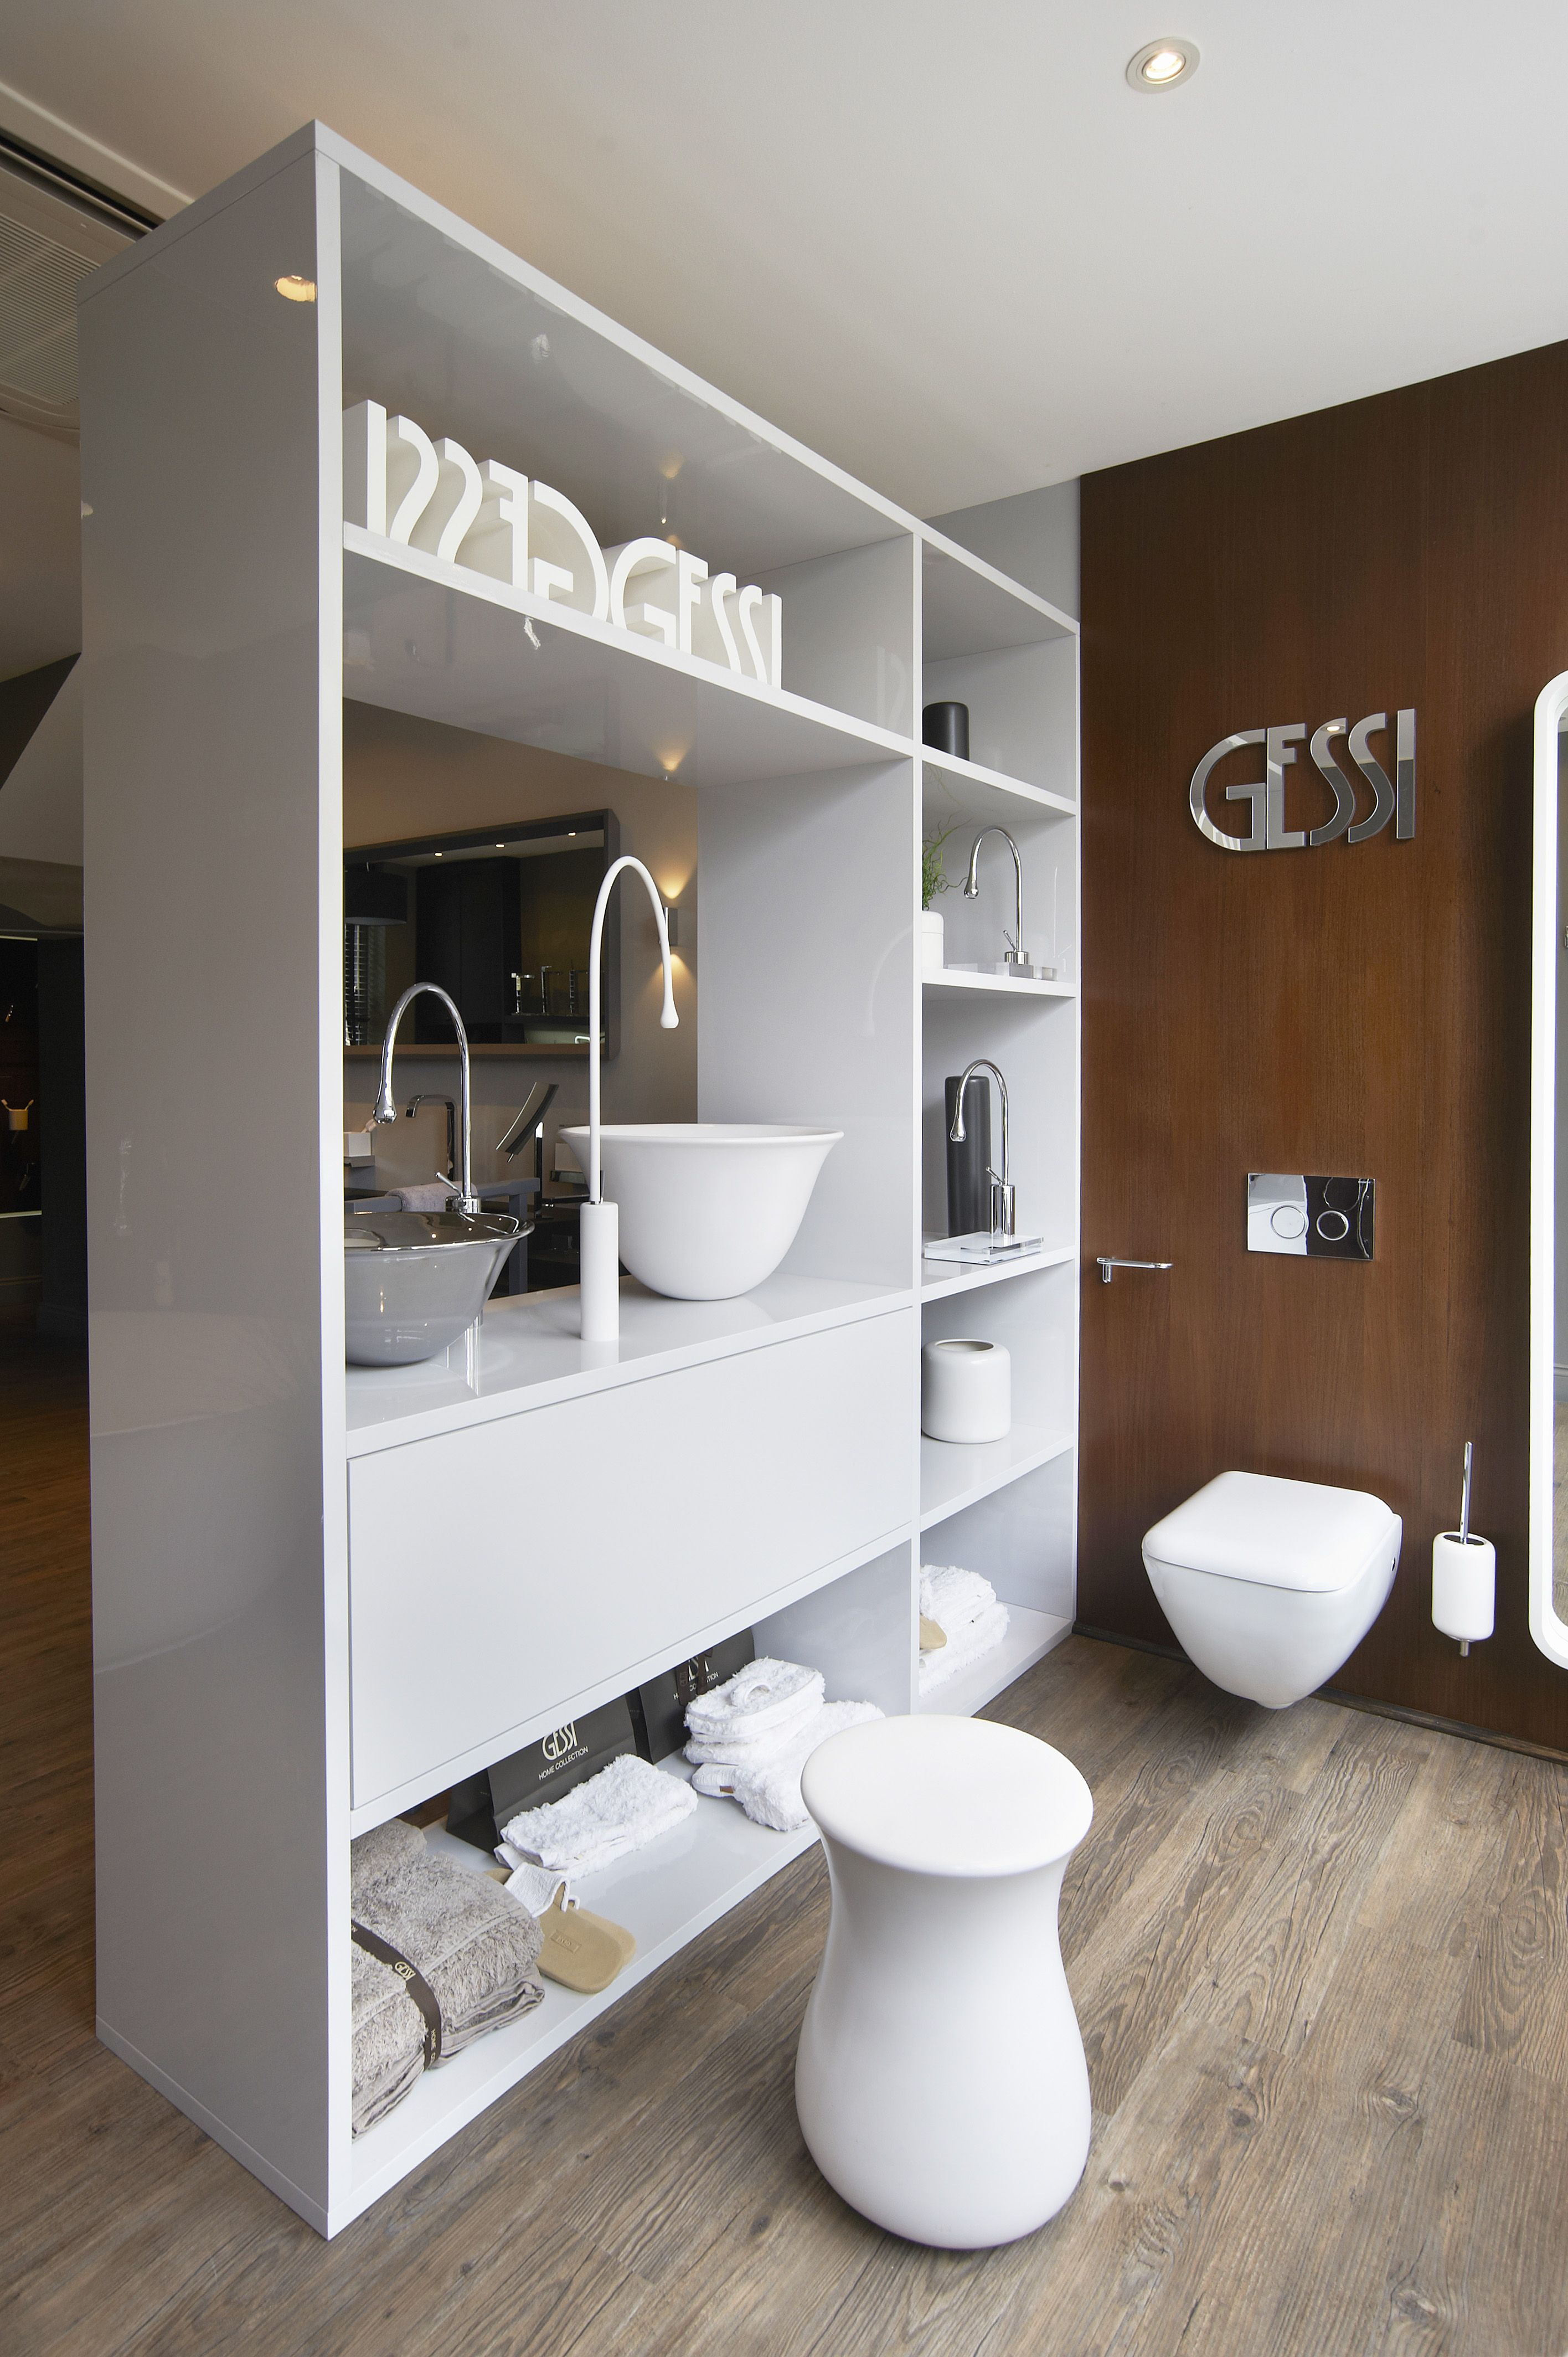 C P Hart 39 S Studio Italiano Bathroom Showroom London Sanitary Showroom Pinterest